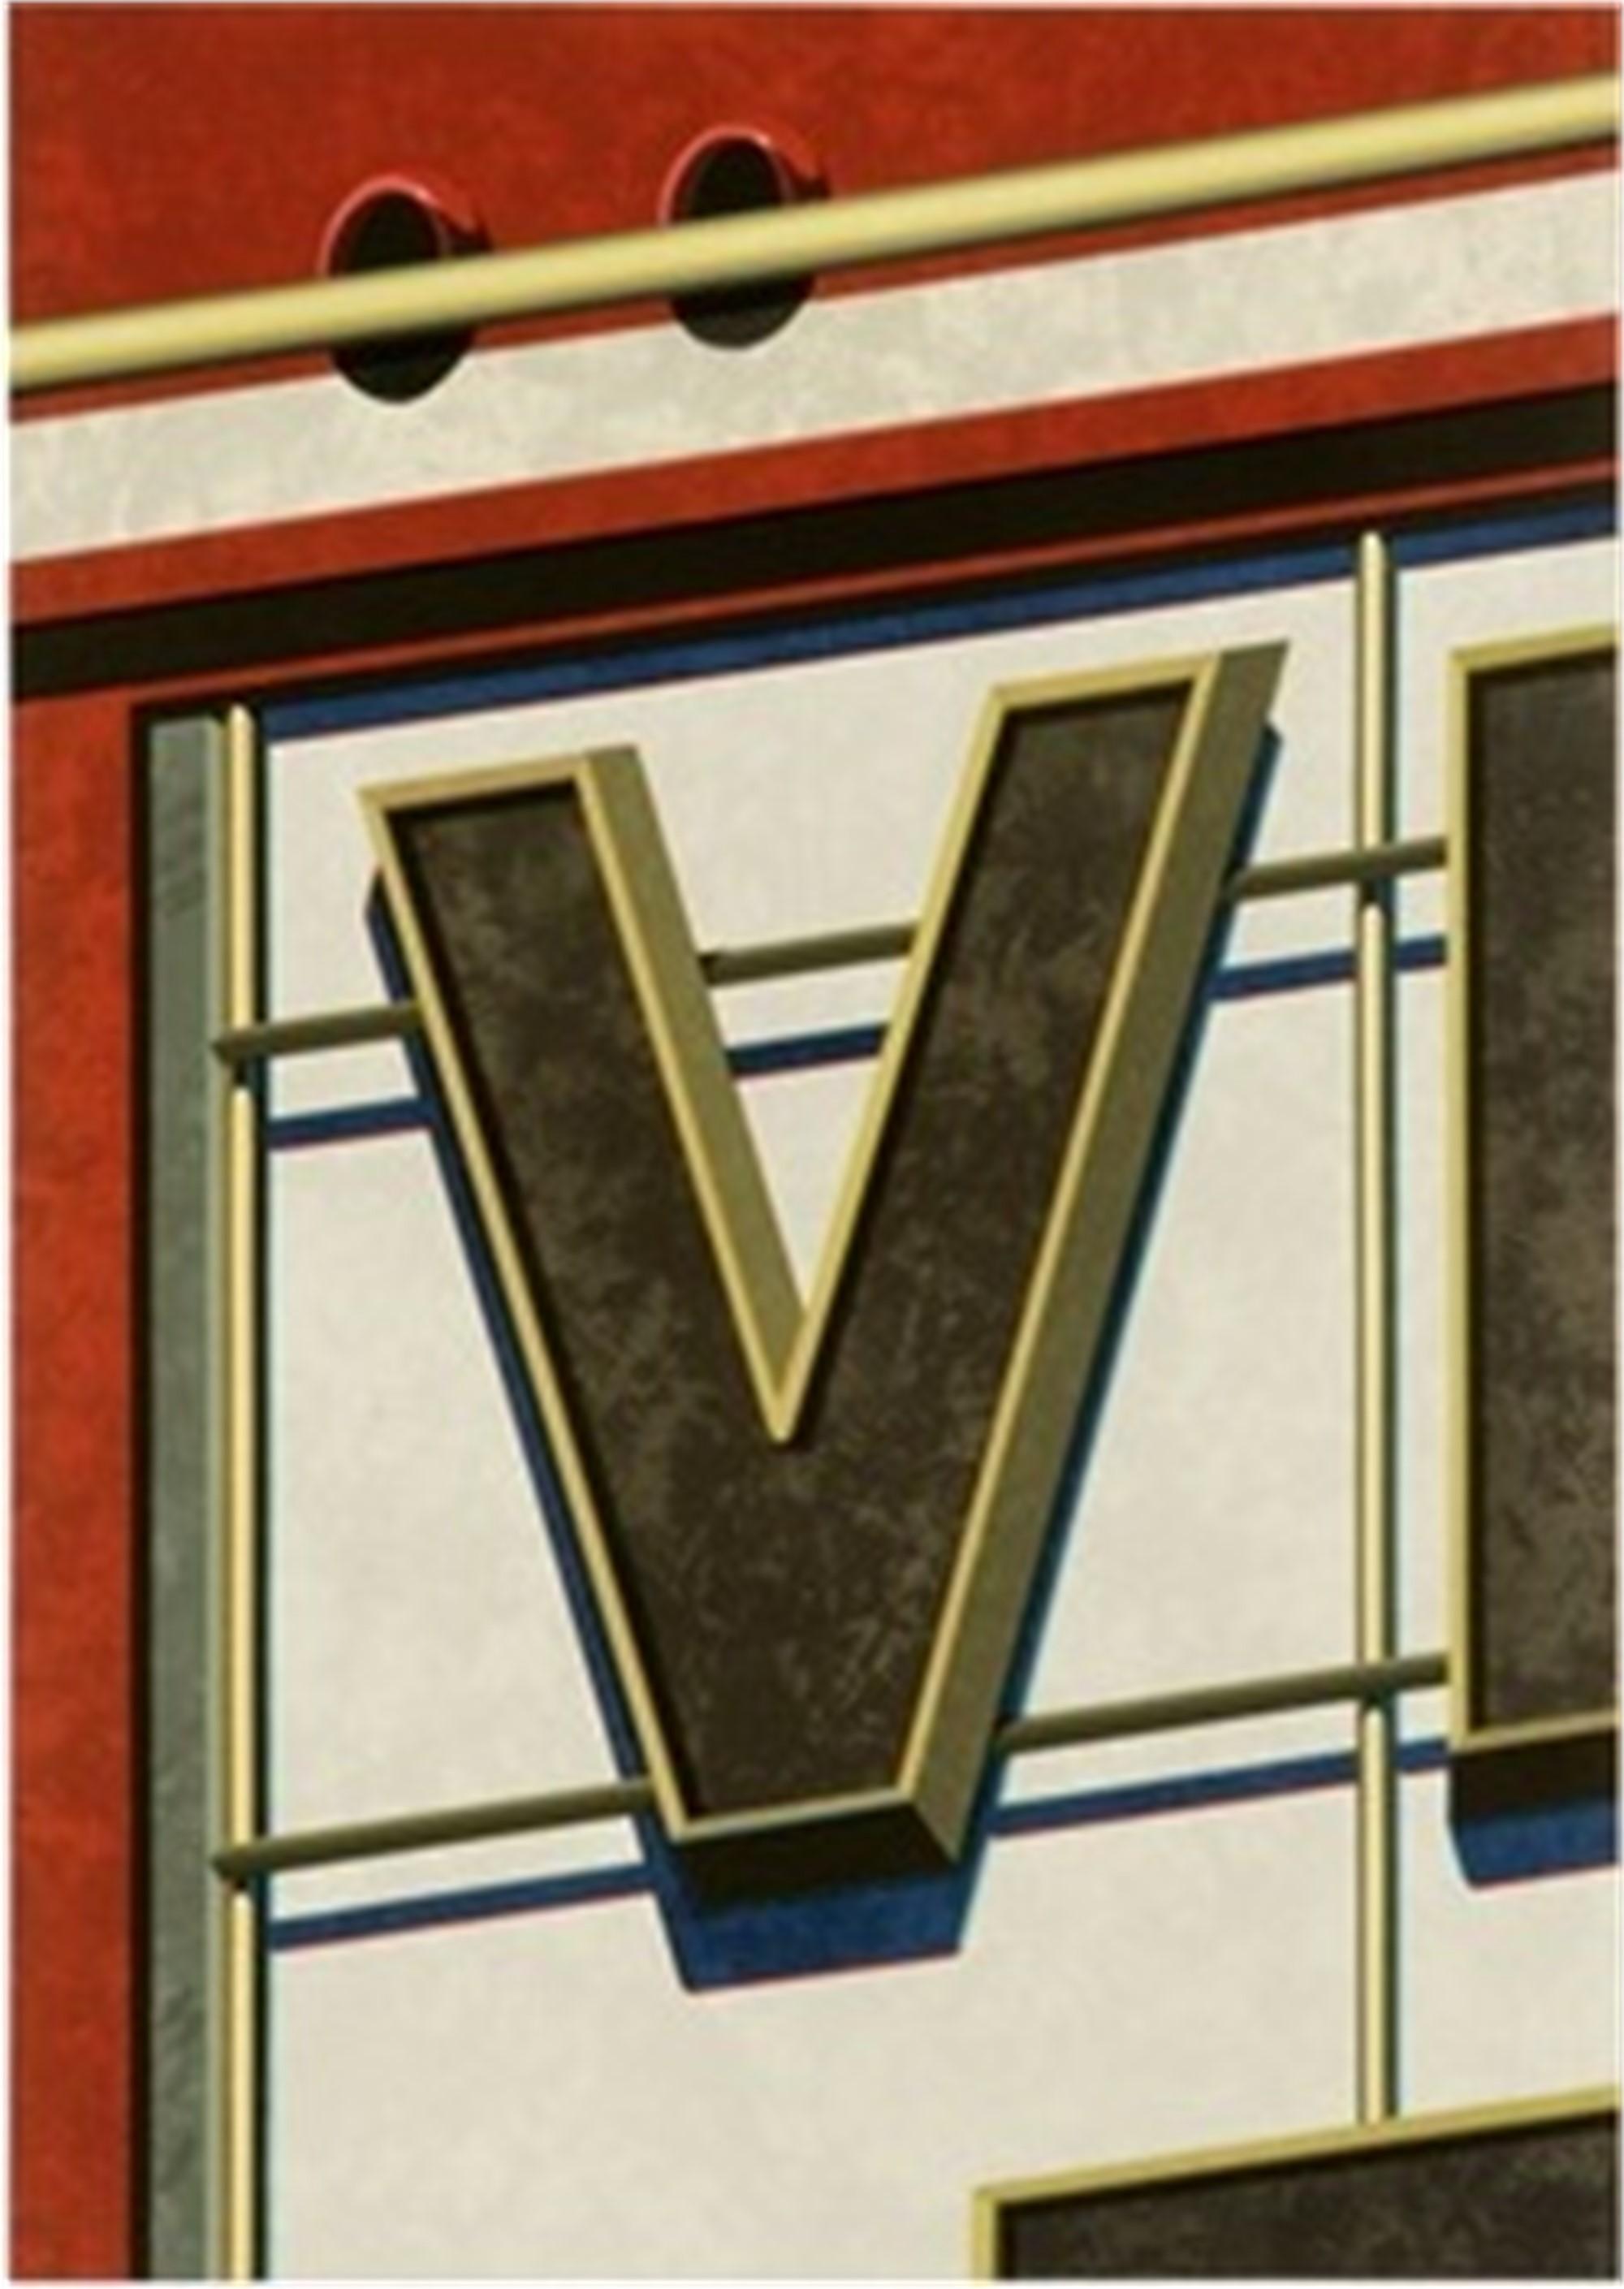 An American Alphabet: V by Robert Cottingham